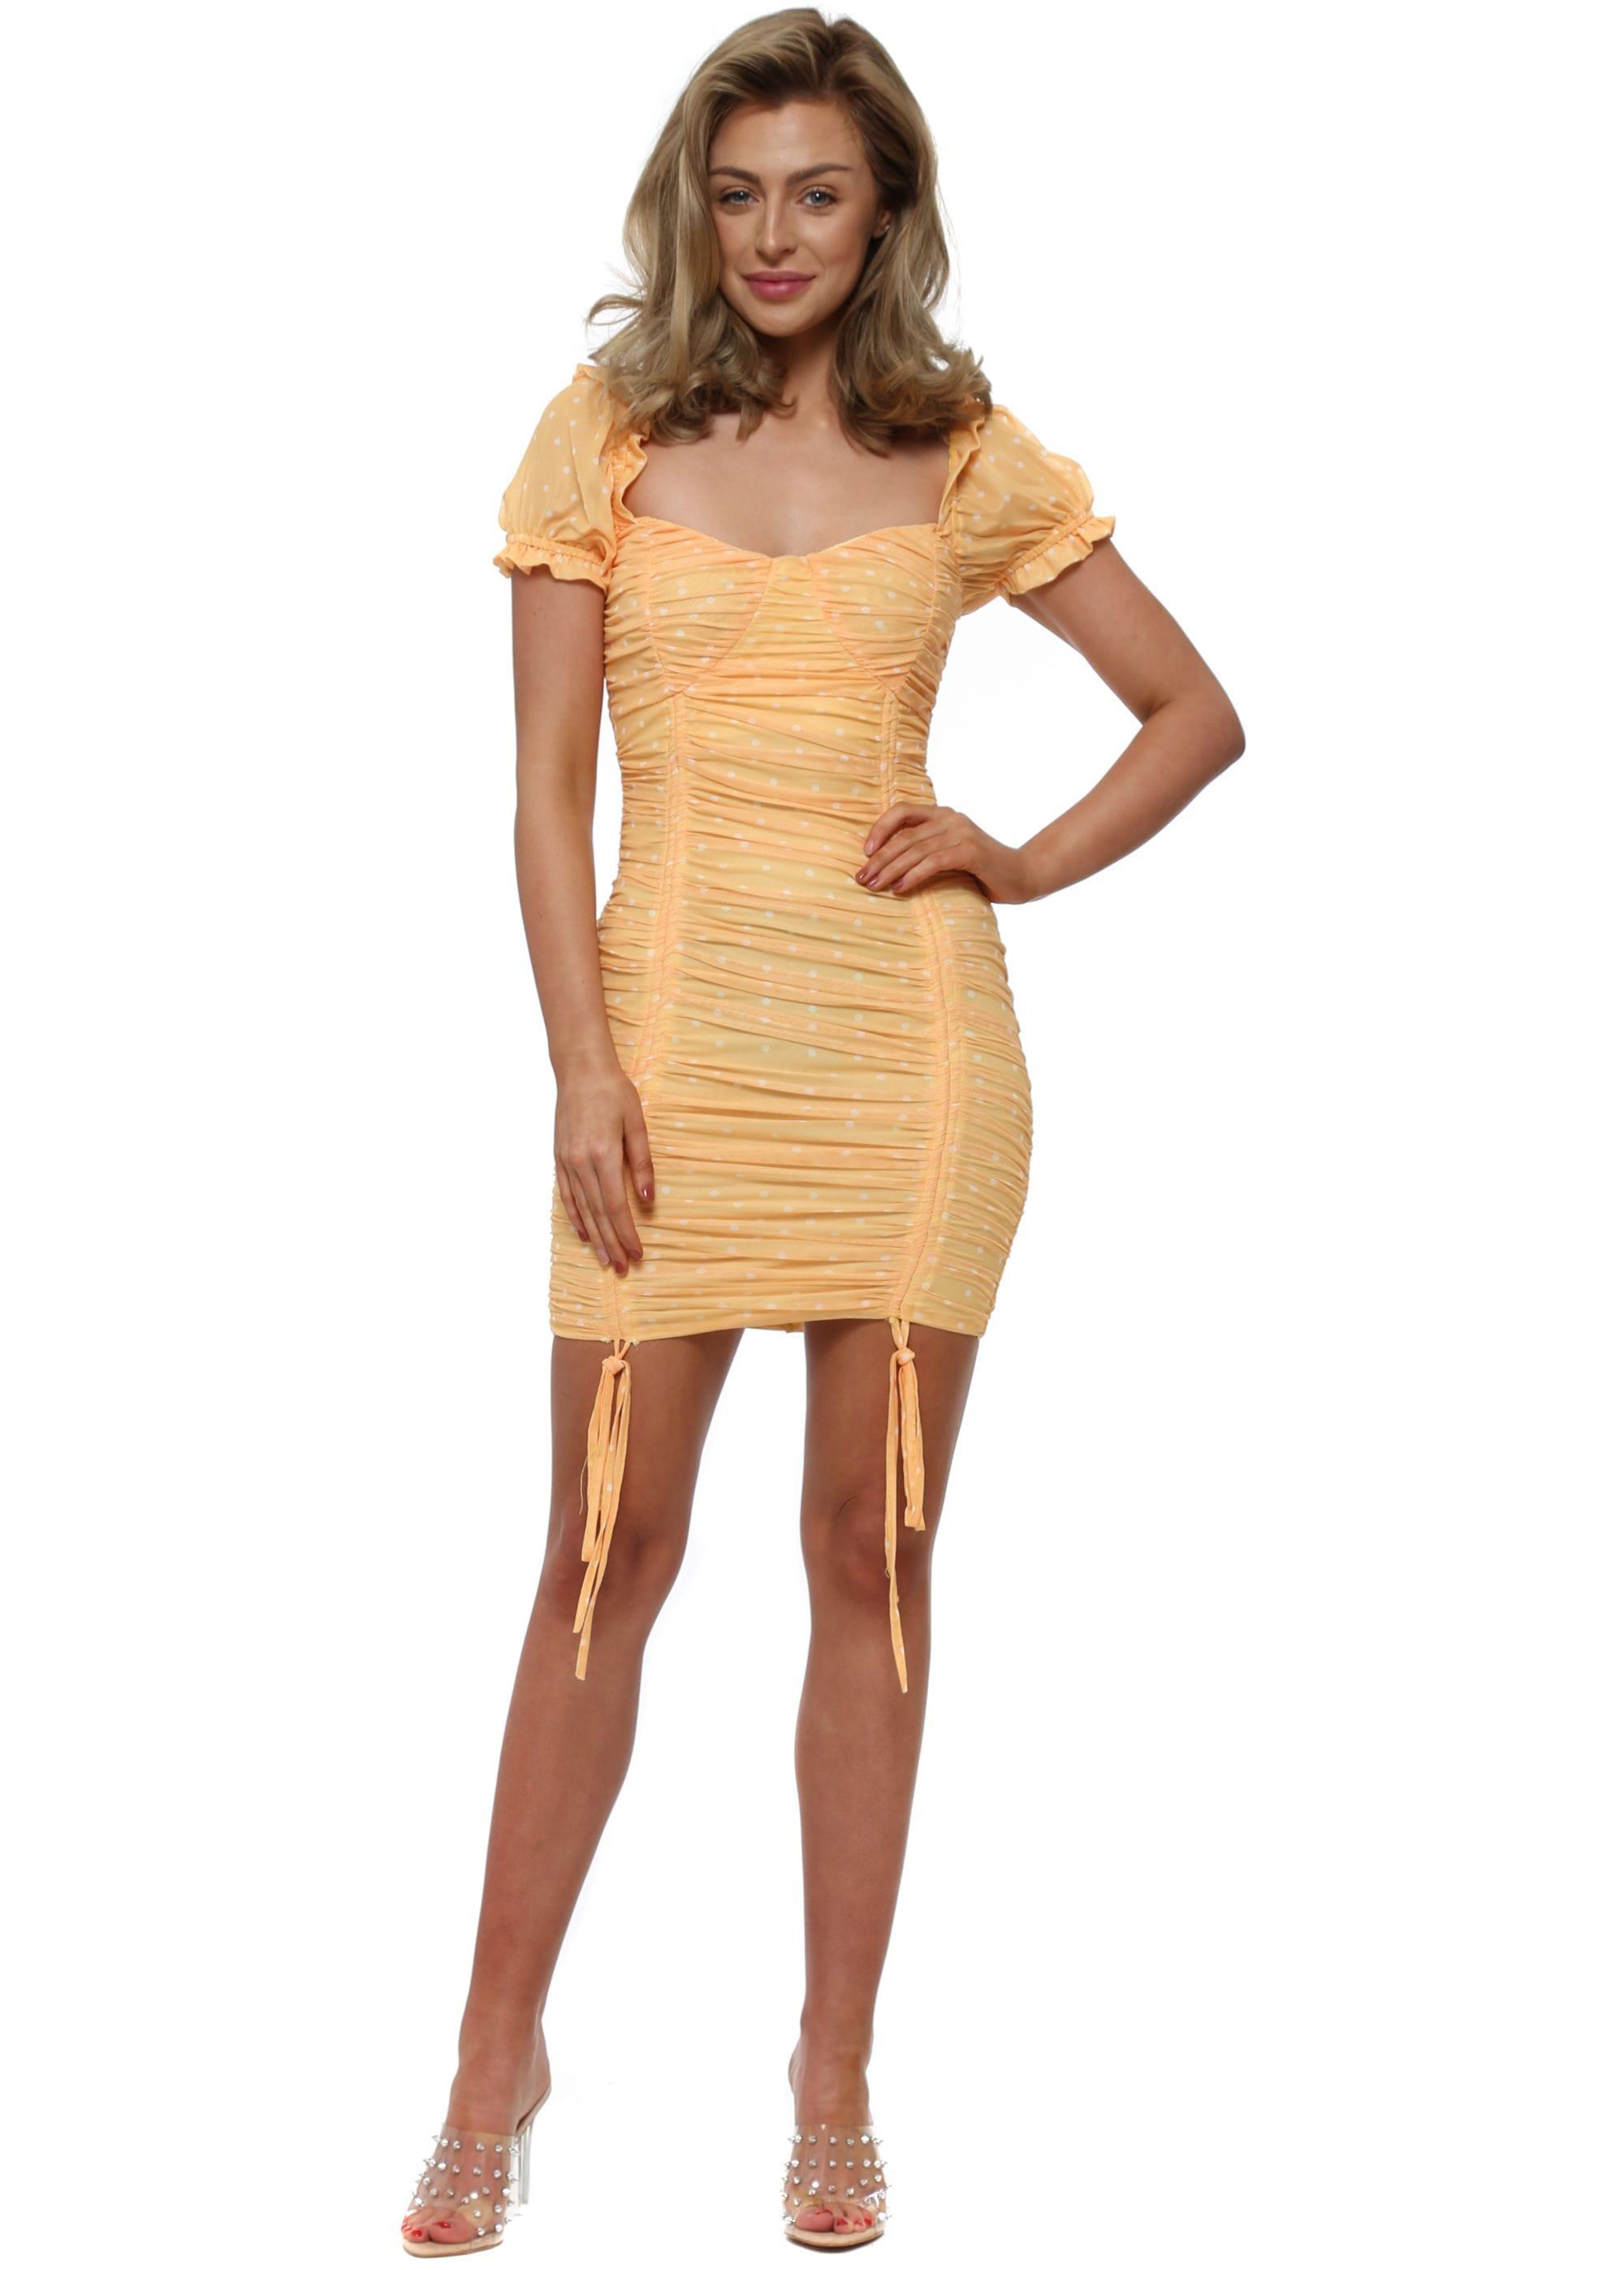 Polka dot rushed mini dress